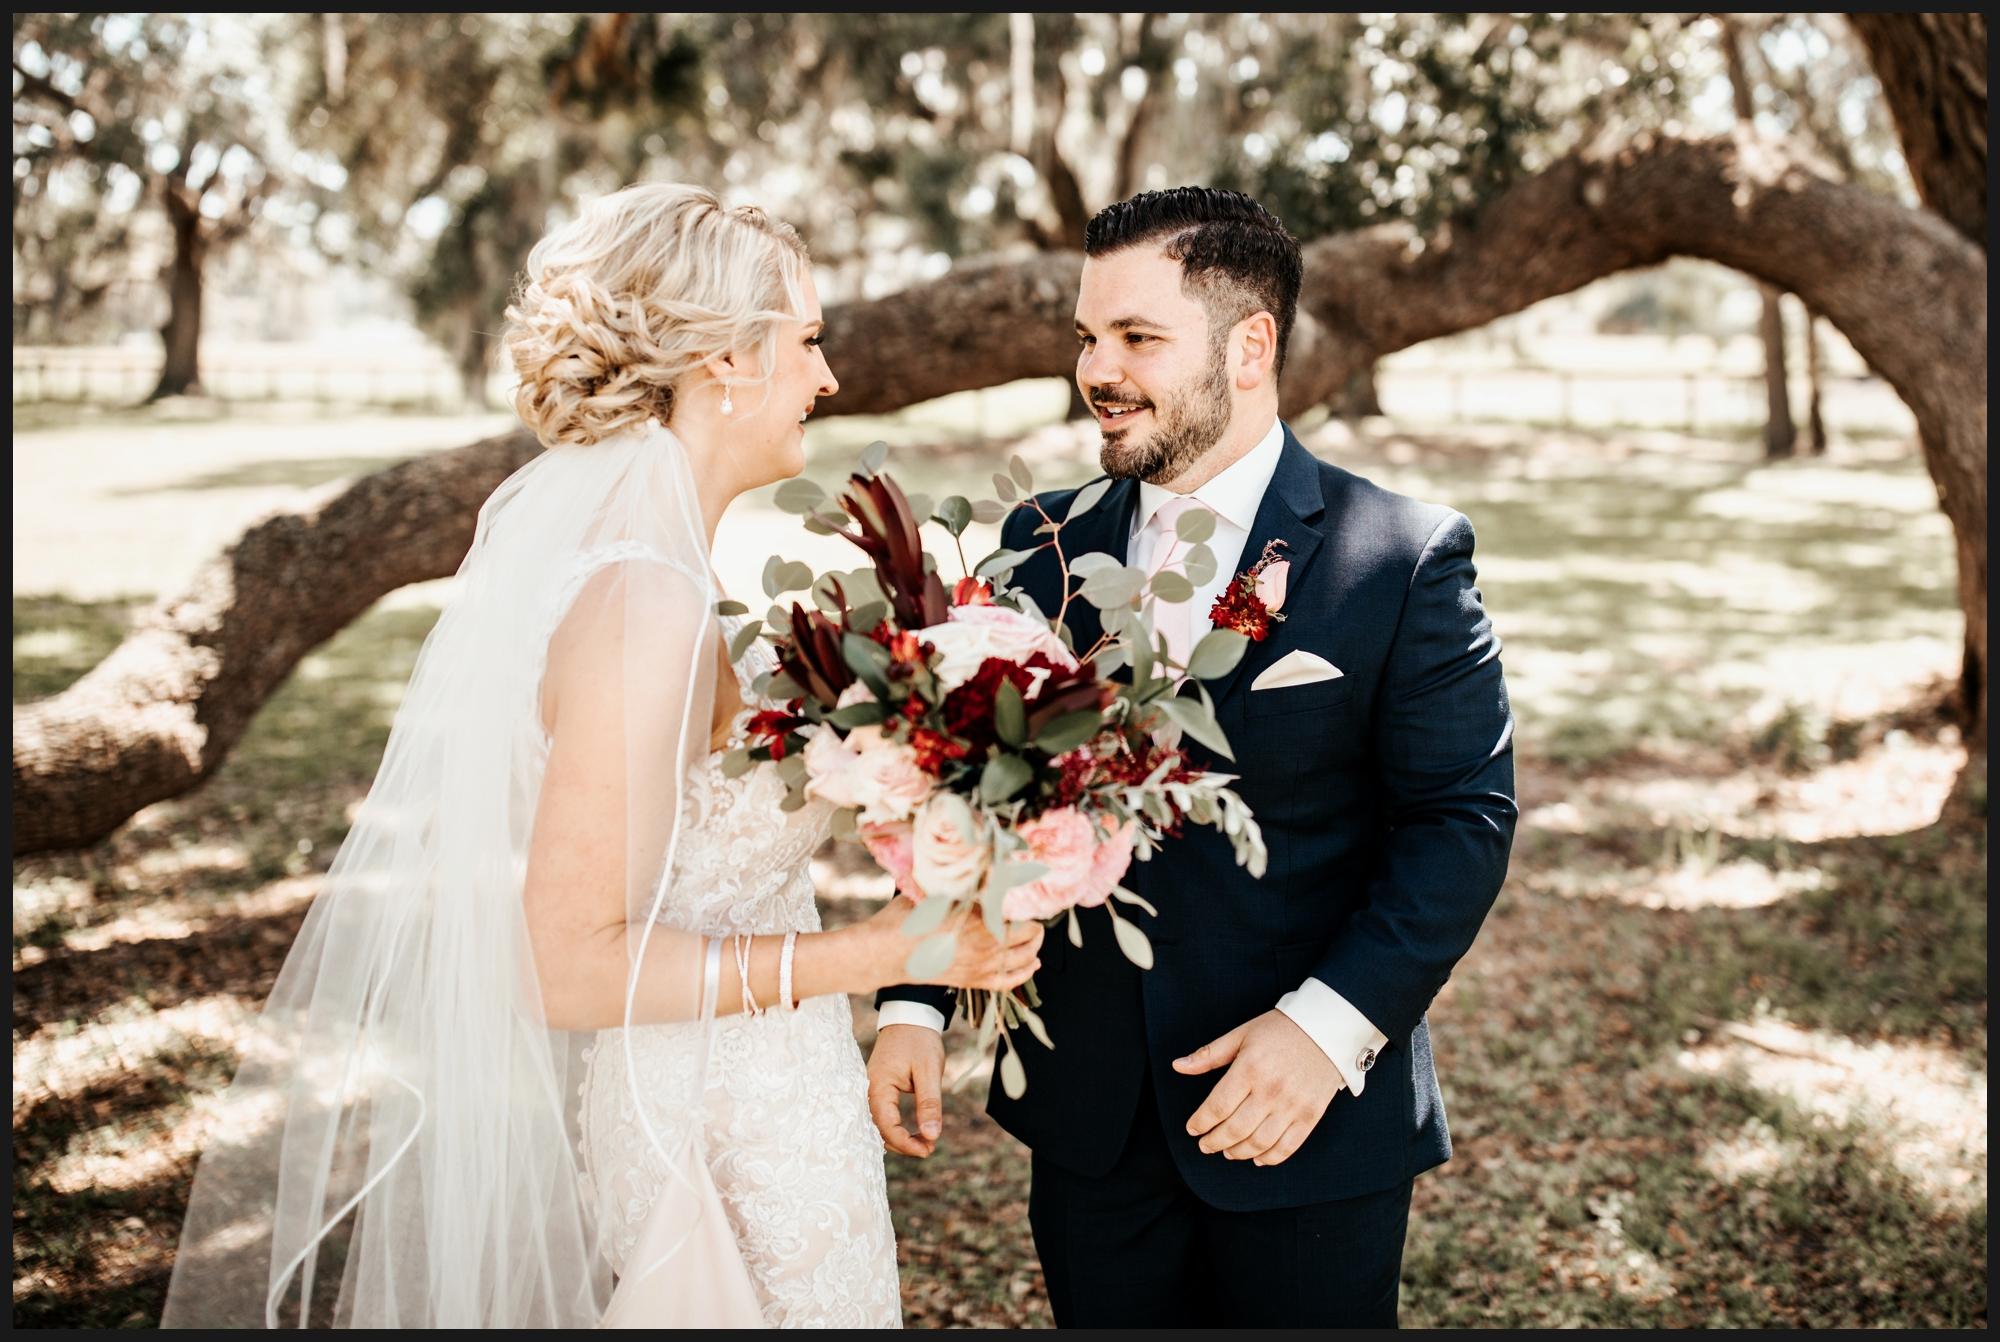 Orlando-Wedding-Photographer-destination-wedding-photographer-florida-wedding-photographer-hawaii-wedding-photographer_0576.jpg